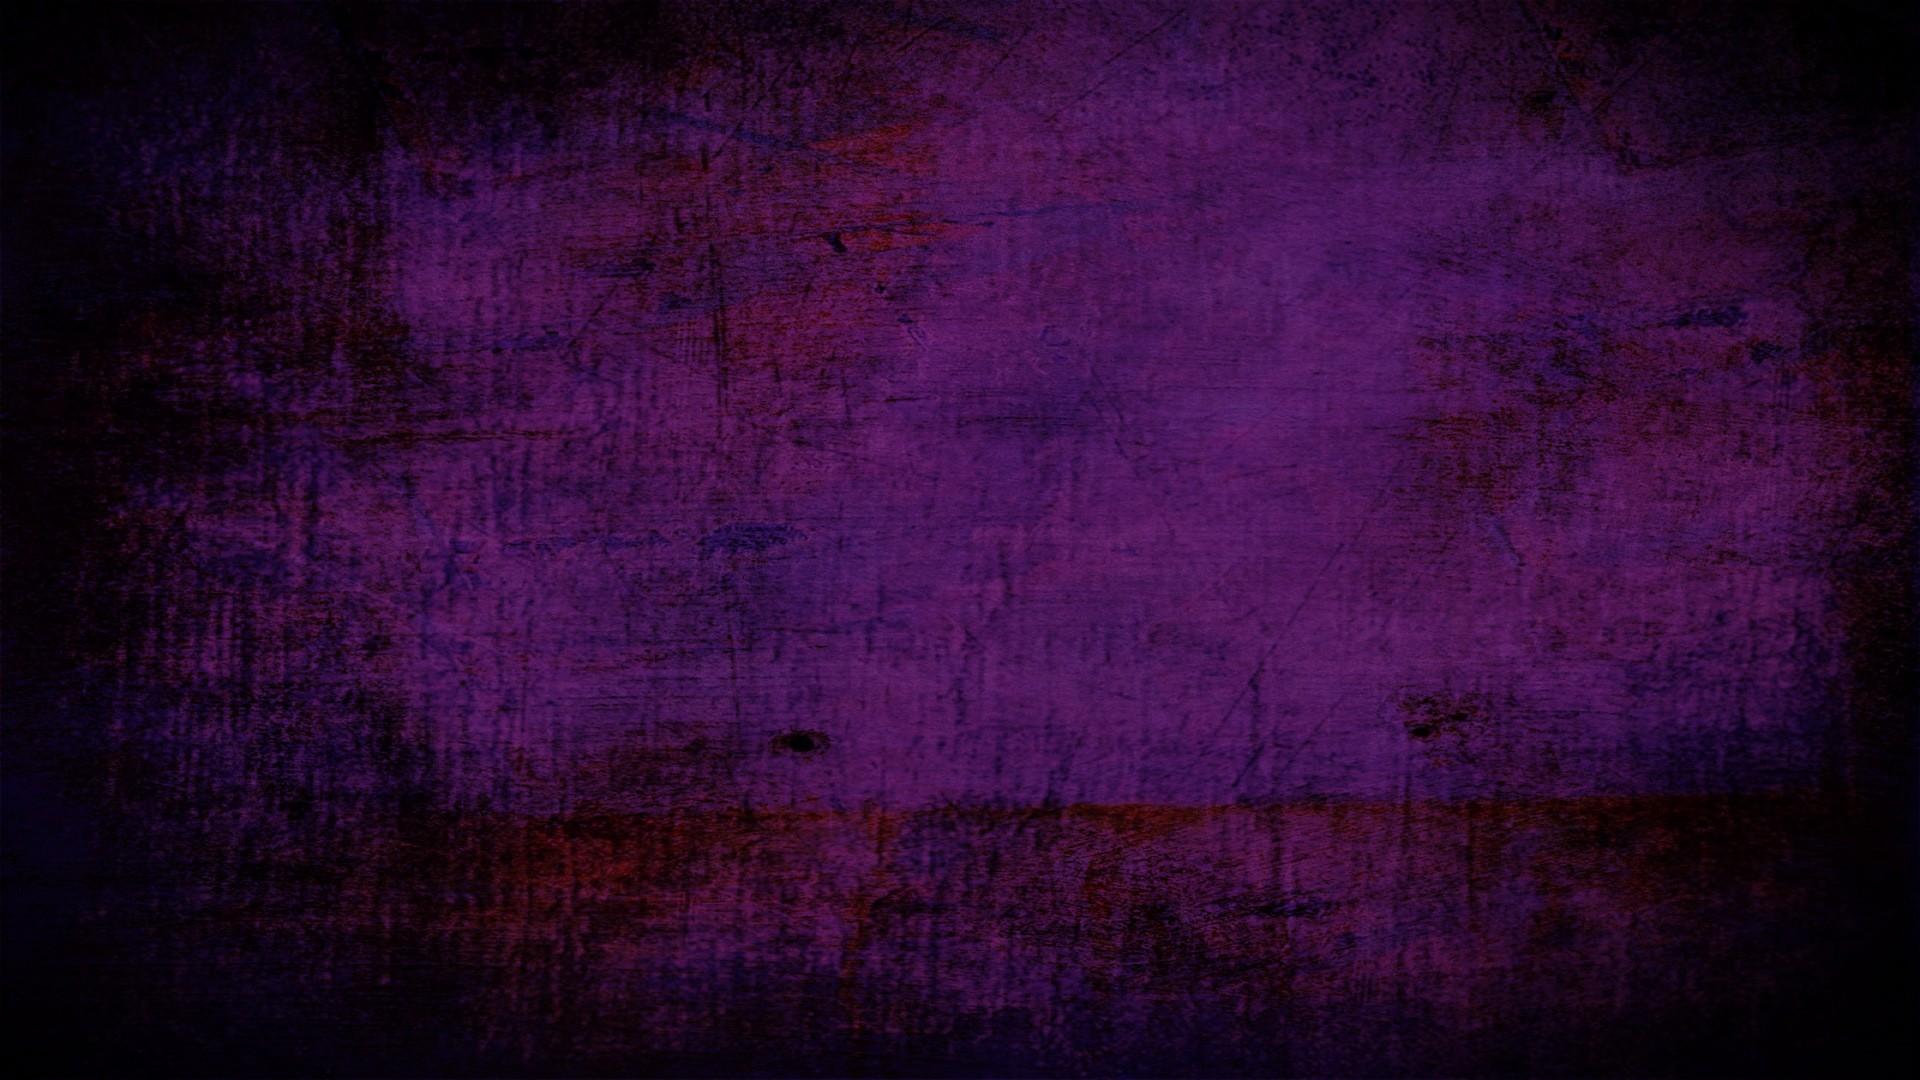 Dark Purple Background 183 ① Download Free Stunning Full Hd